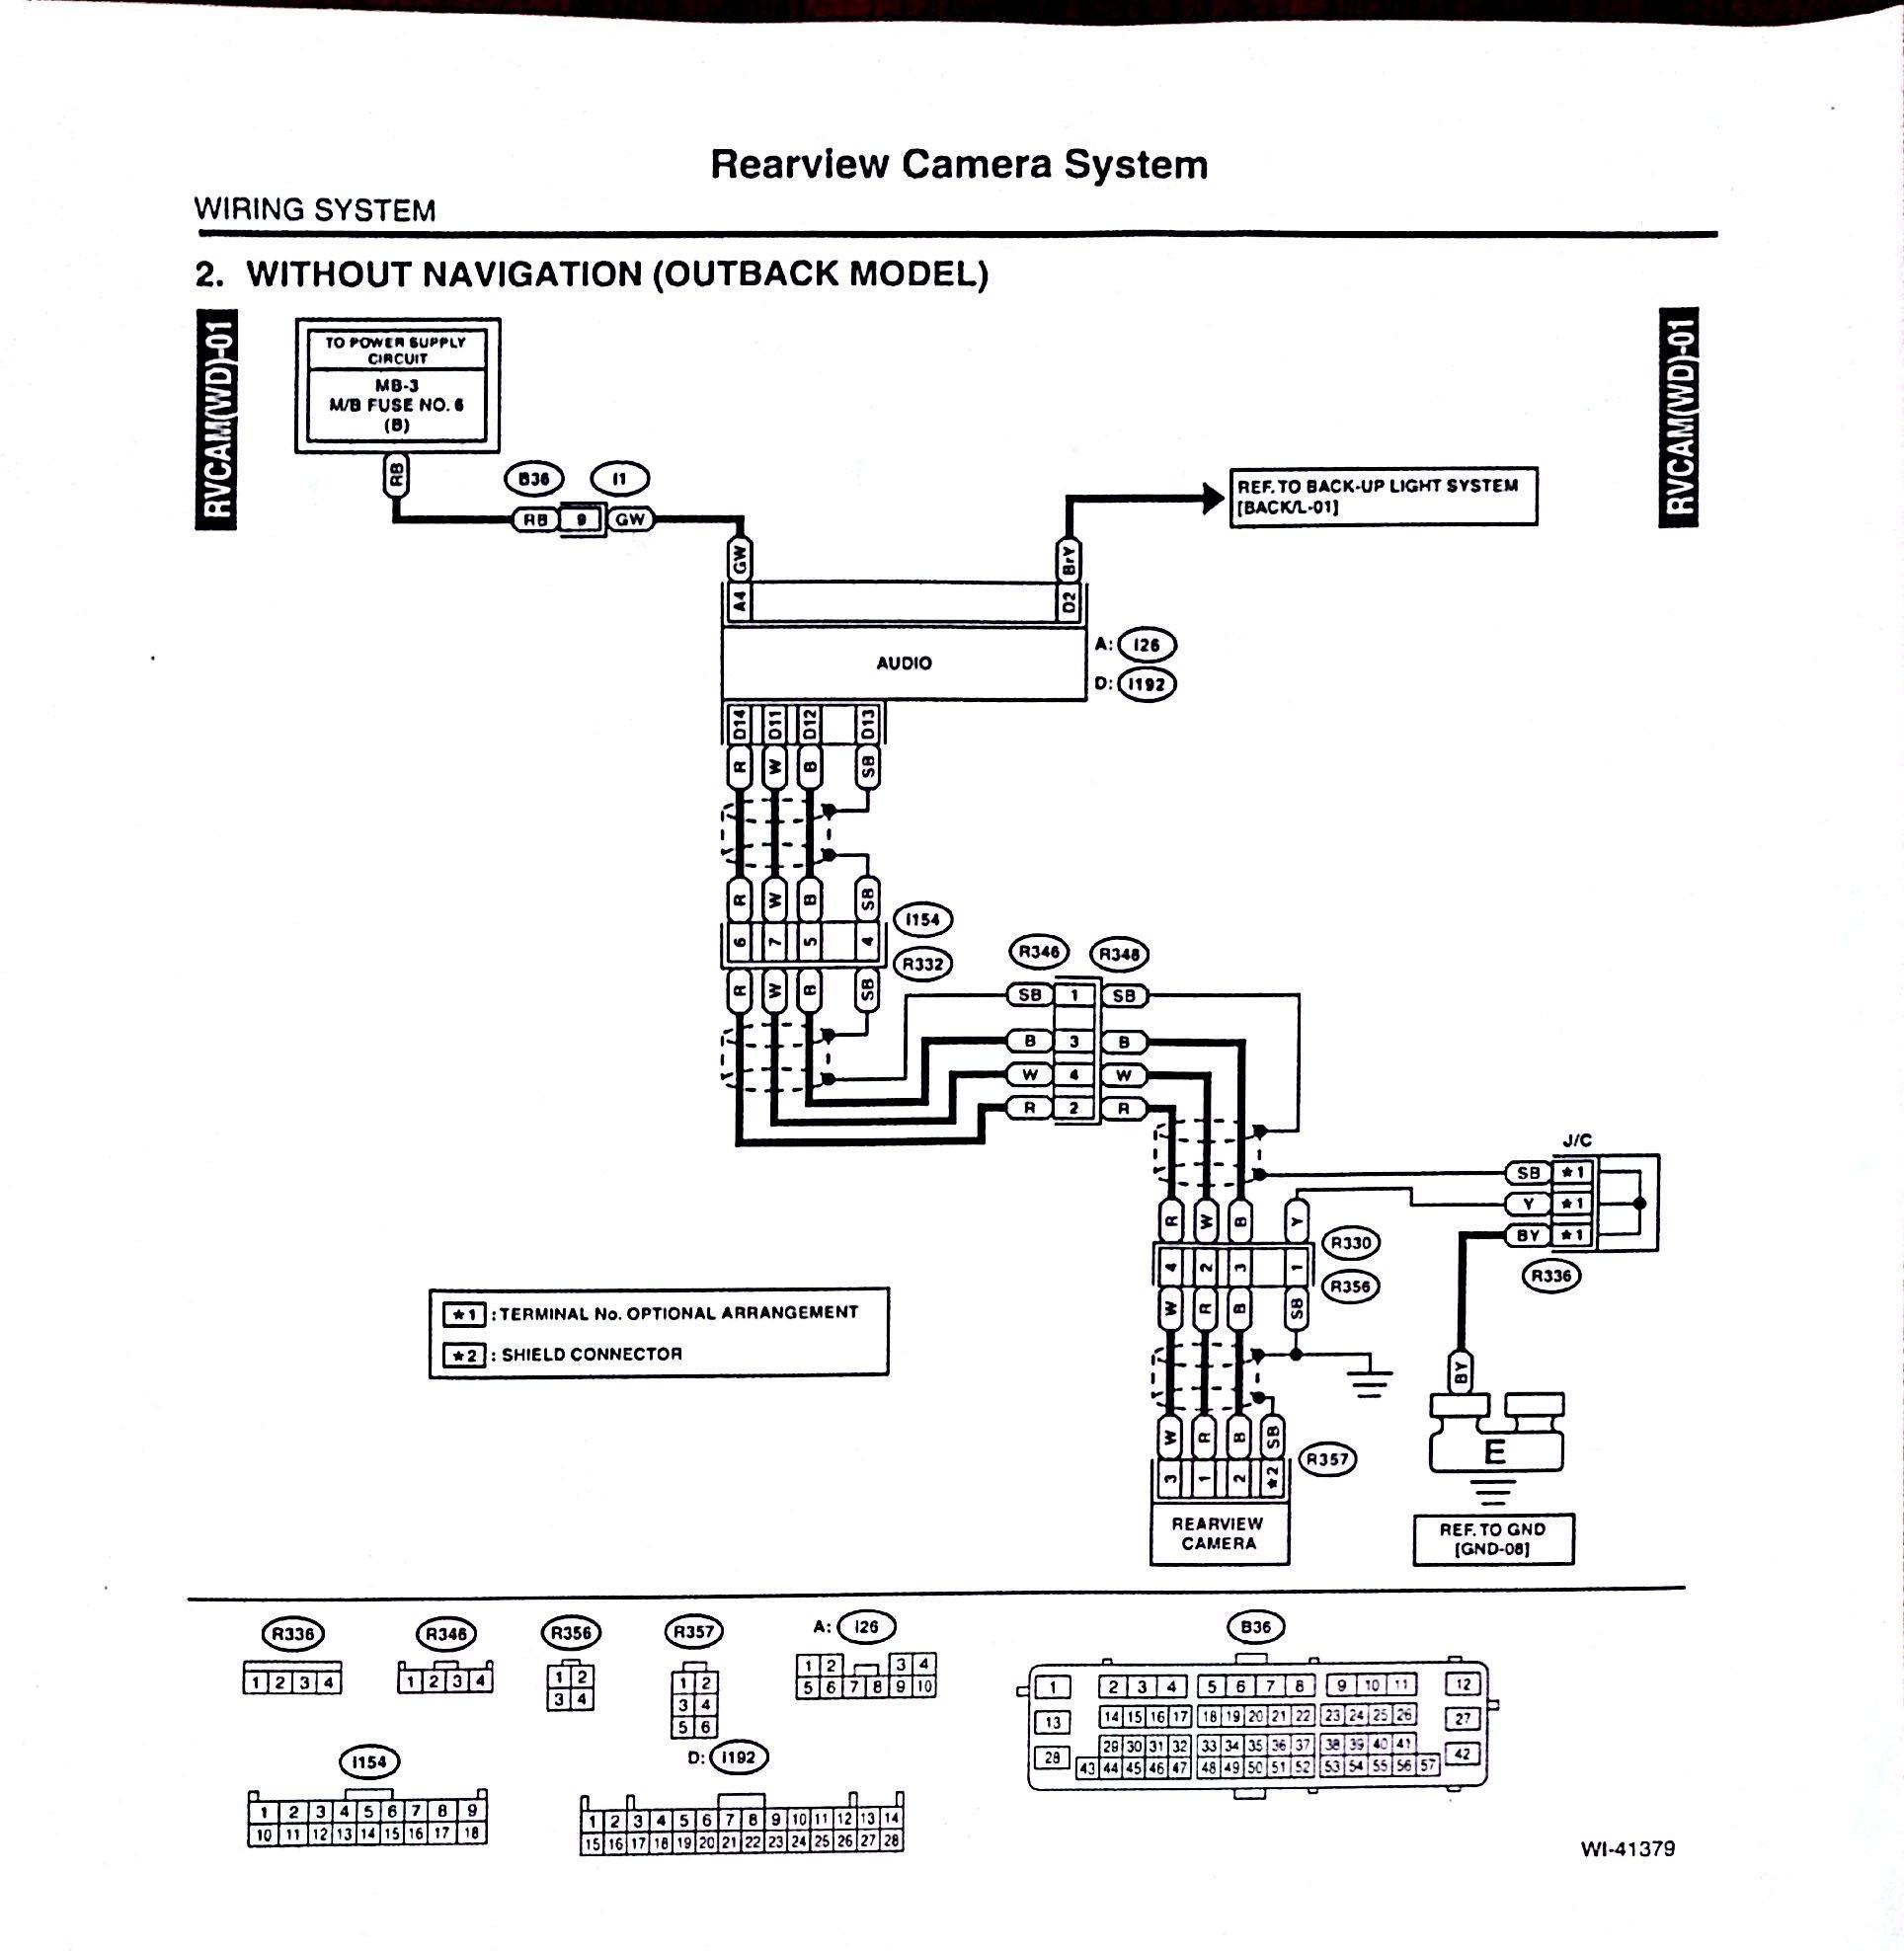 Wiring Diagram For Pyle Pld71mu Diagrams Data Base Car Stereo Plbt73g Nemetas Aufgegabelt Info Rh On Touch Screen Radio Plcm7500 Image